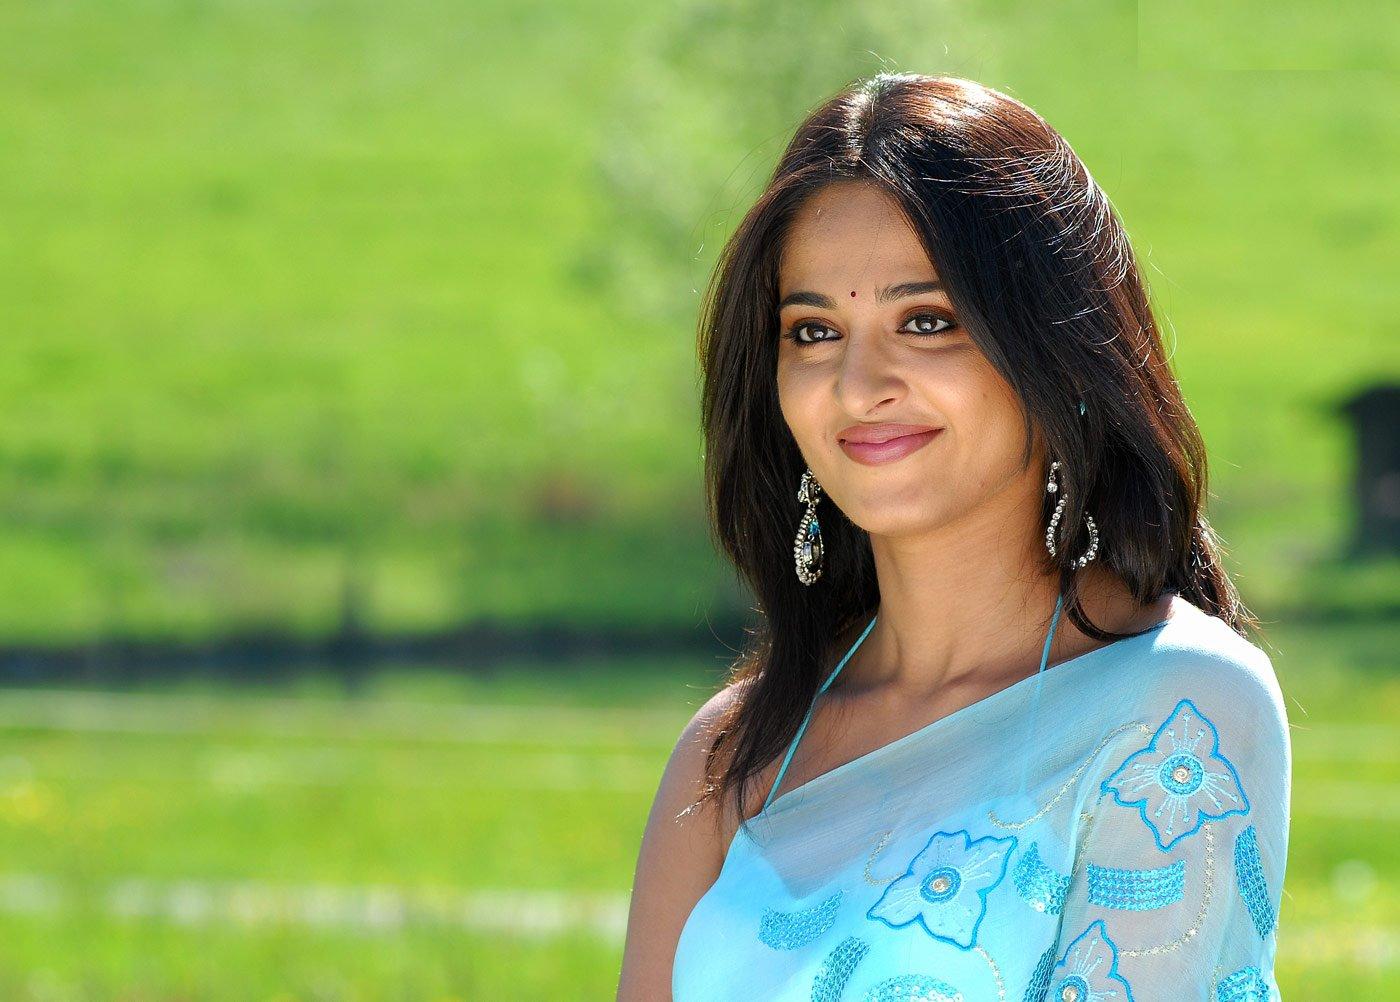 Anushka Shetty in Saree Wallpaper HD Wallpapers 1400x1002